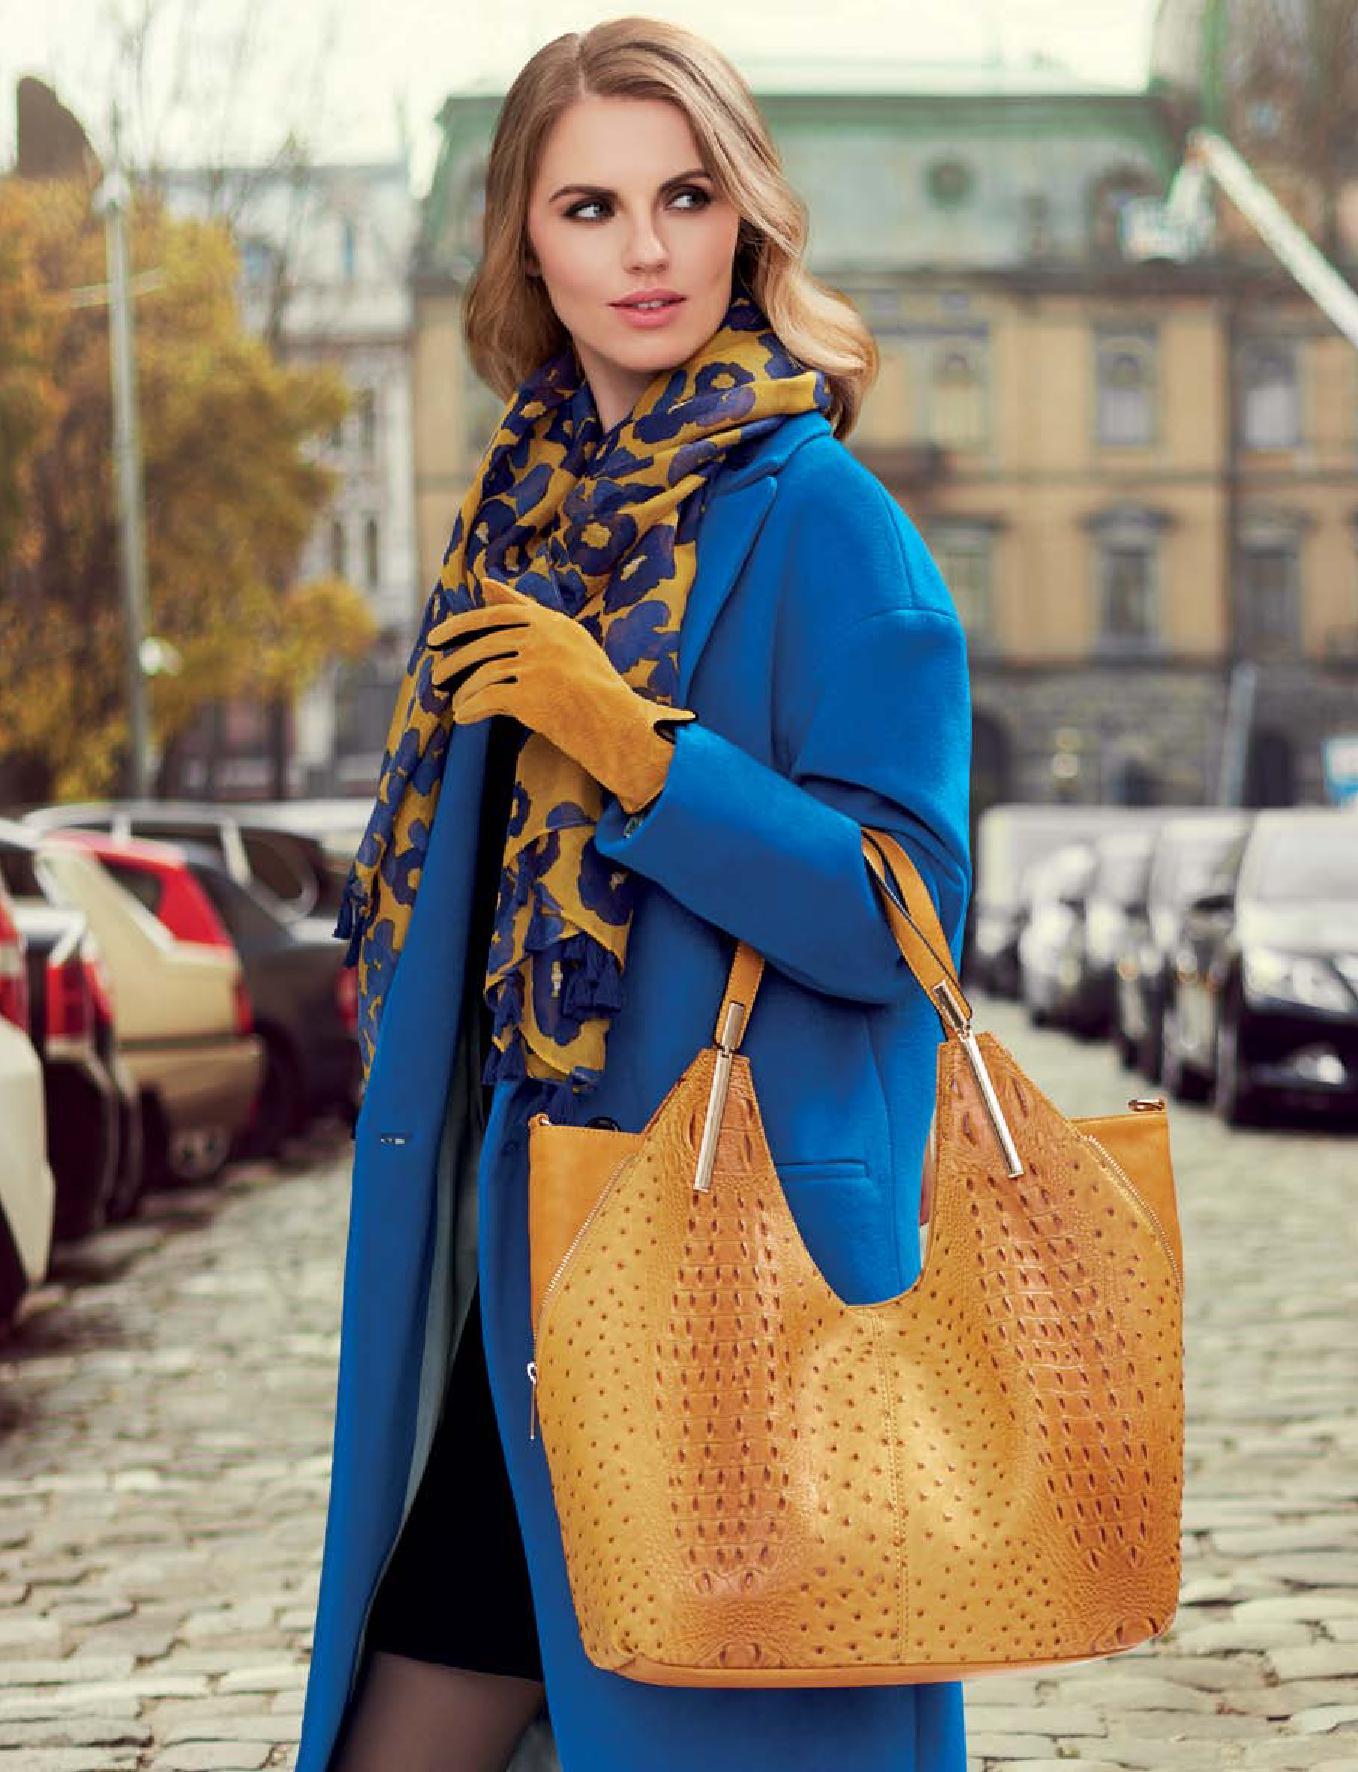 Флоранж Стайл - сумка и перчатки Эбби, и шарф Юнона